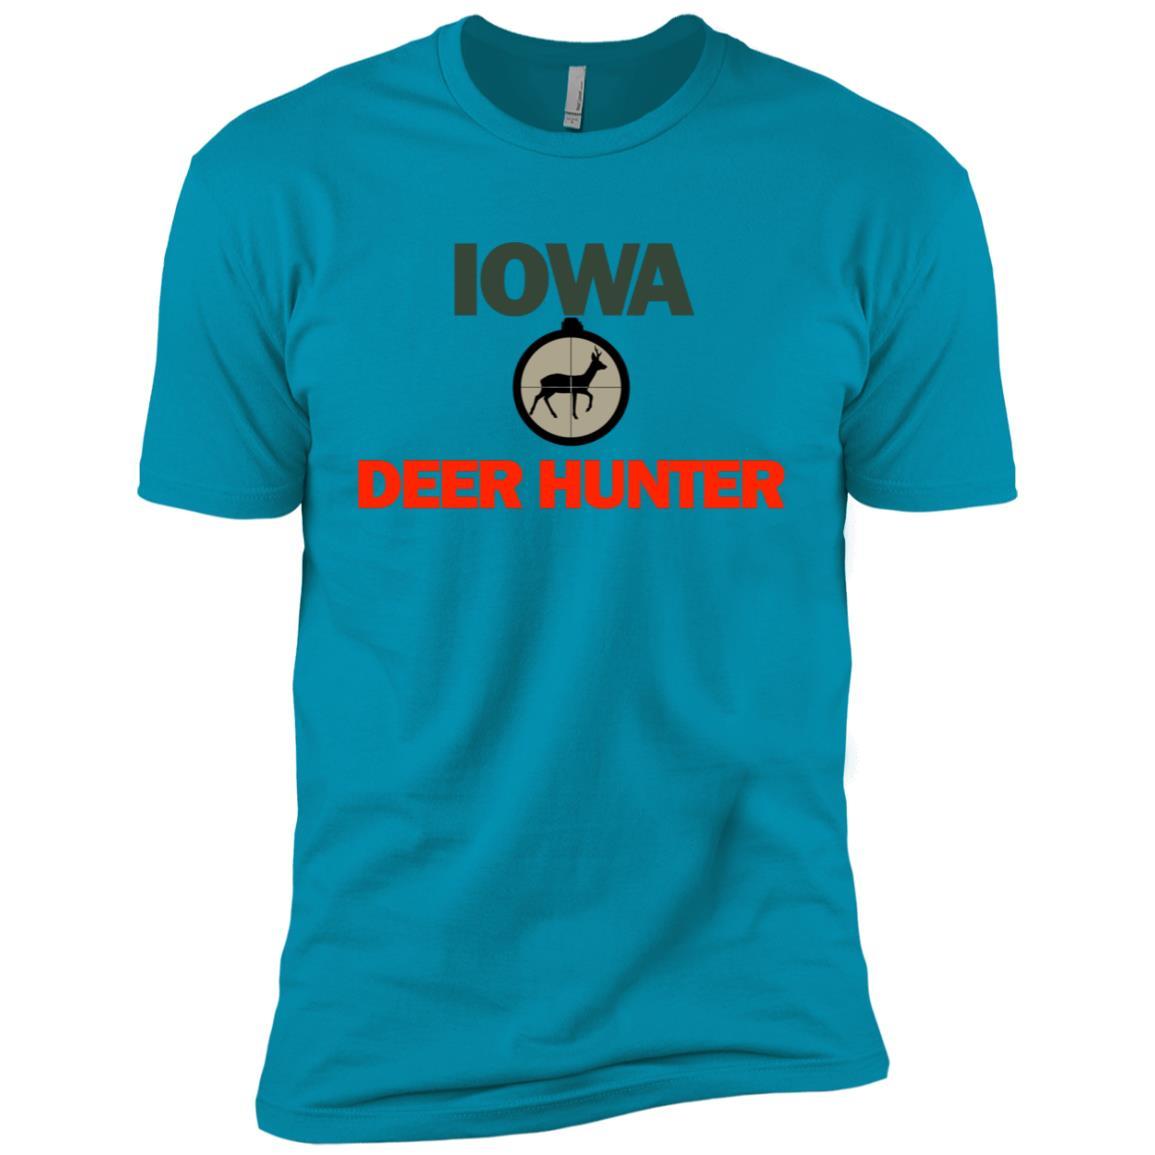 Cool Iowa Deer Hunter for Those Who Love t Men Short Sleeve T-Shirt